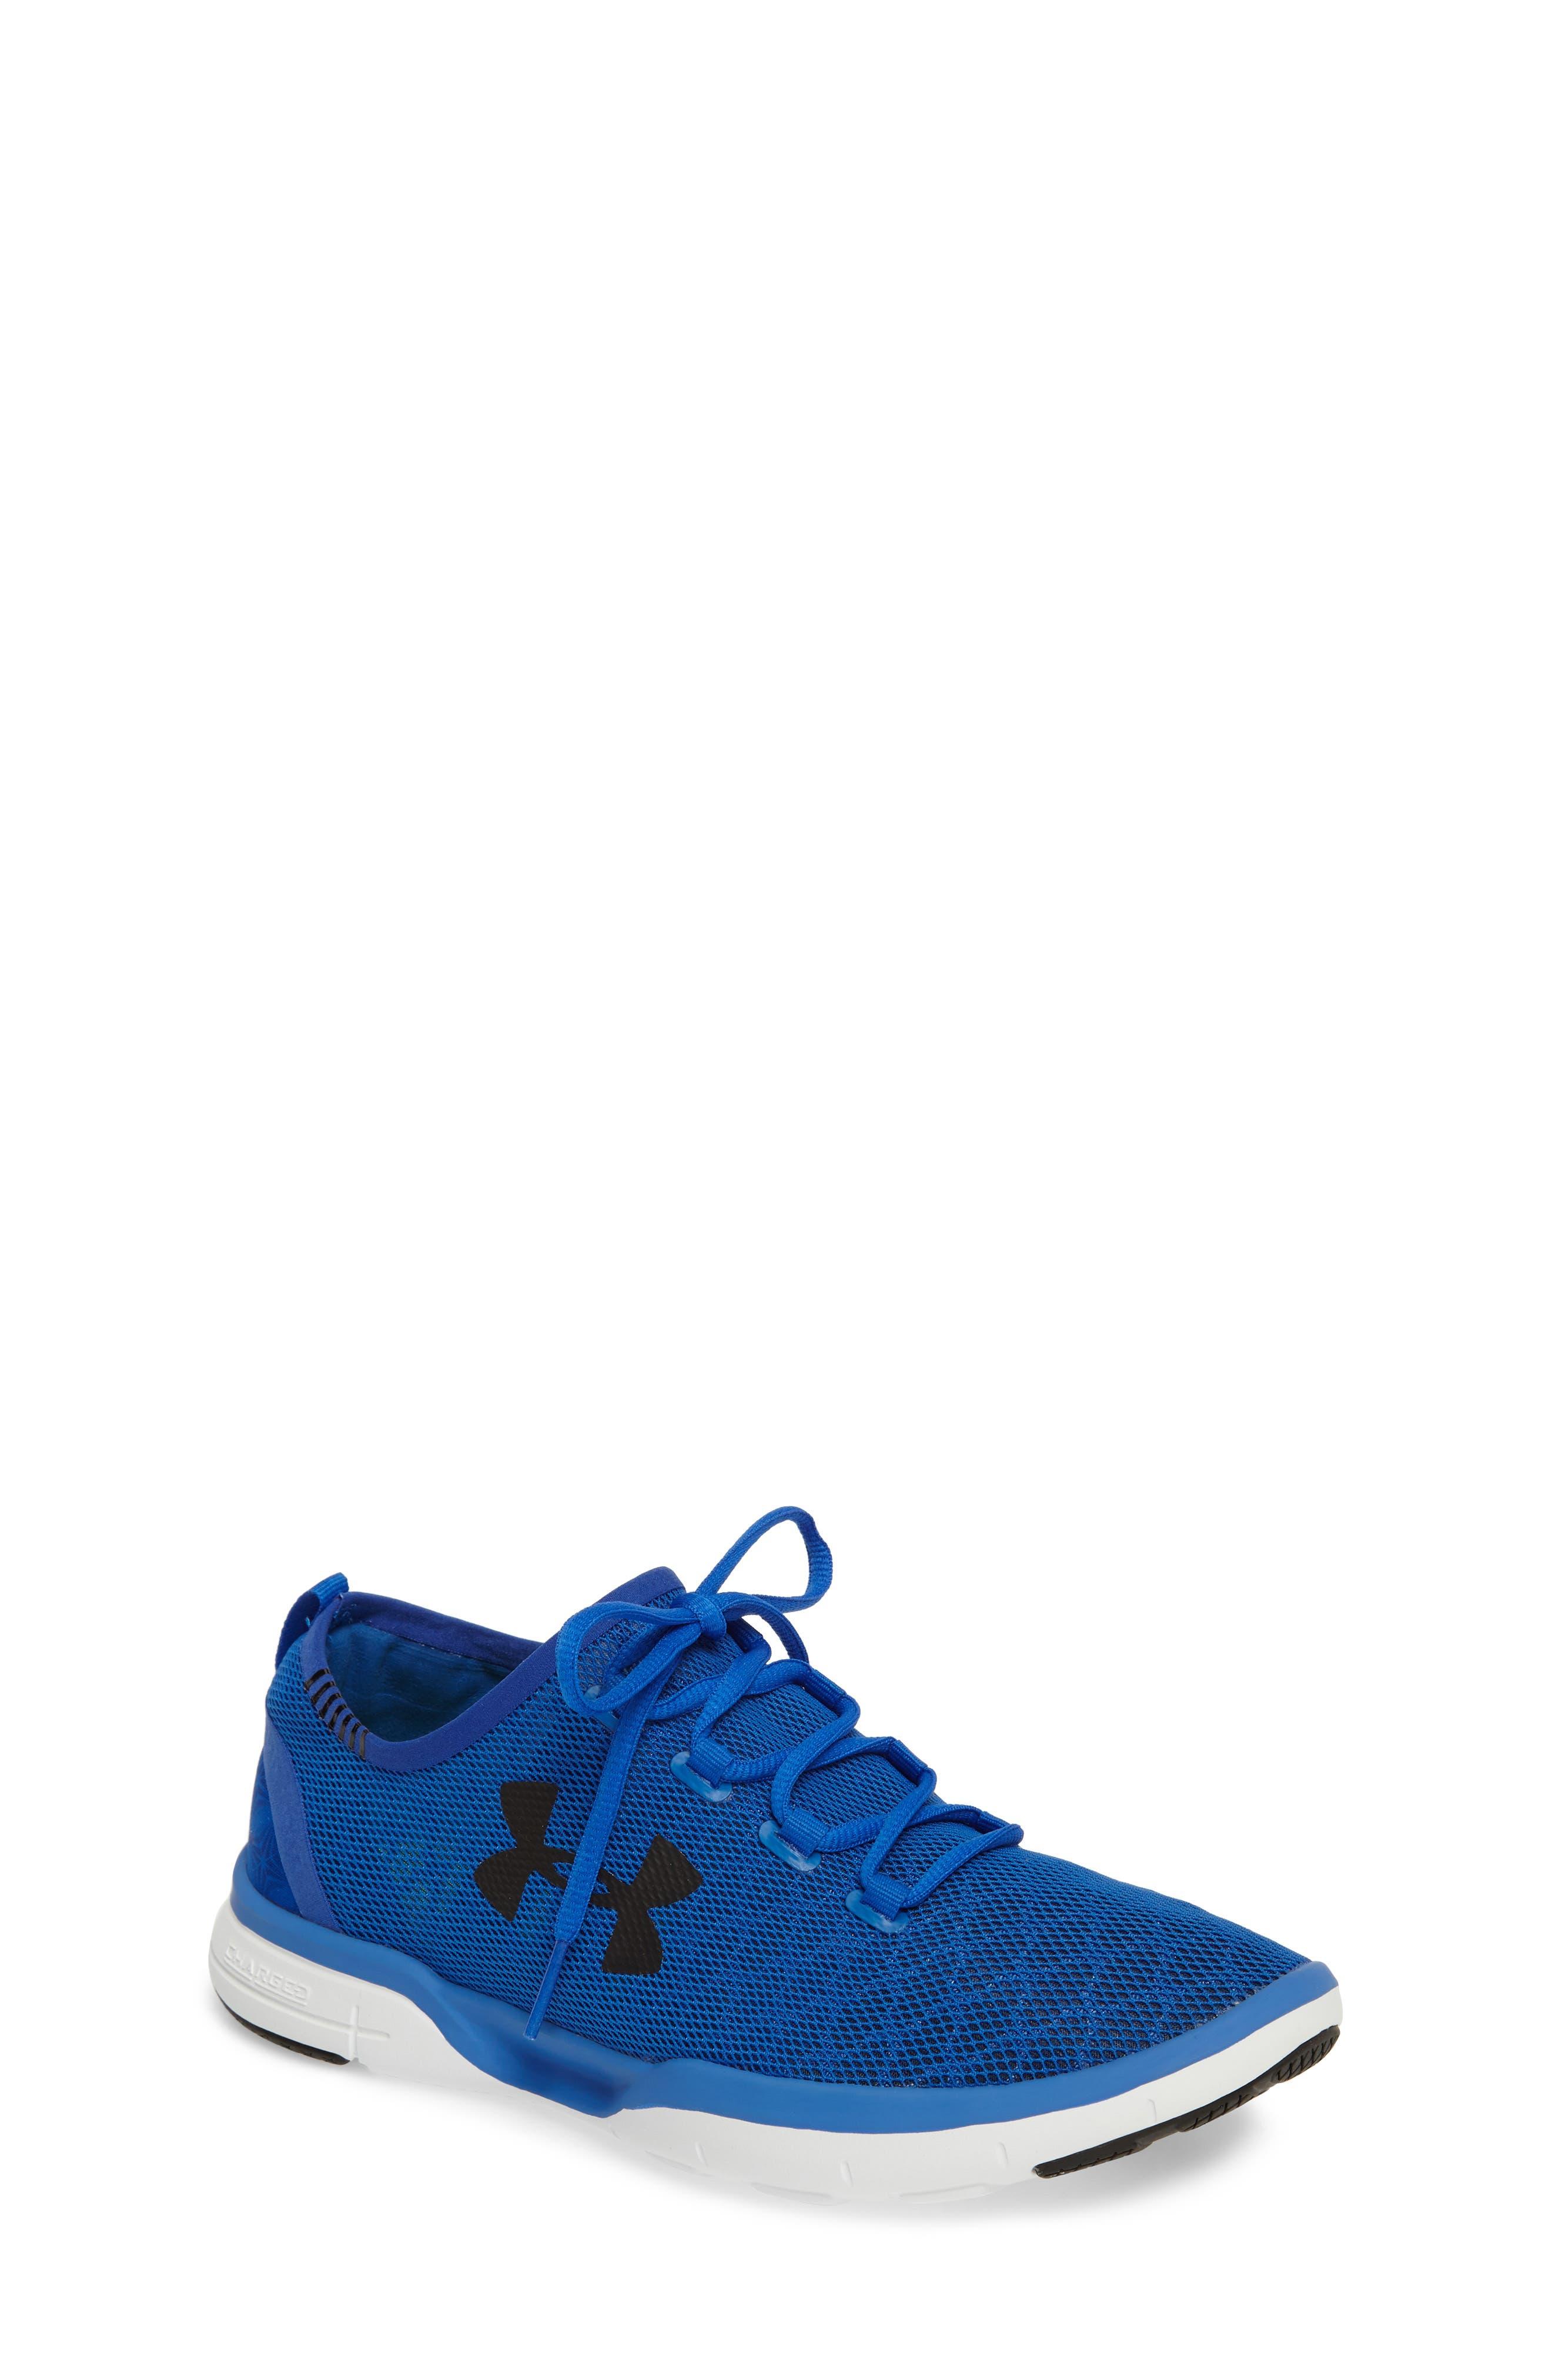 Under Armour Primed Sneaker (Big Kid)